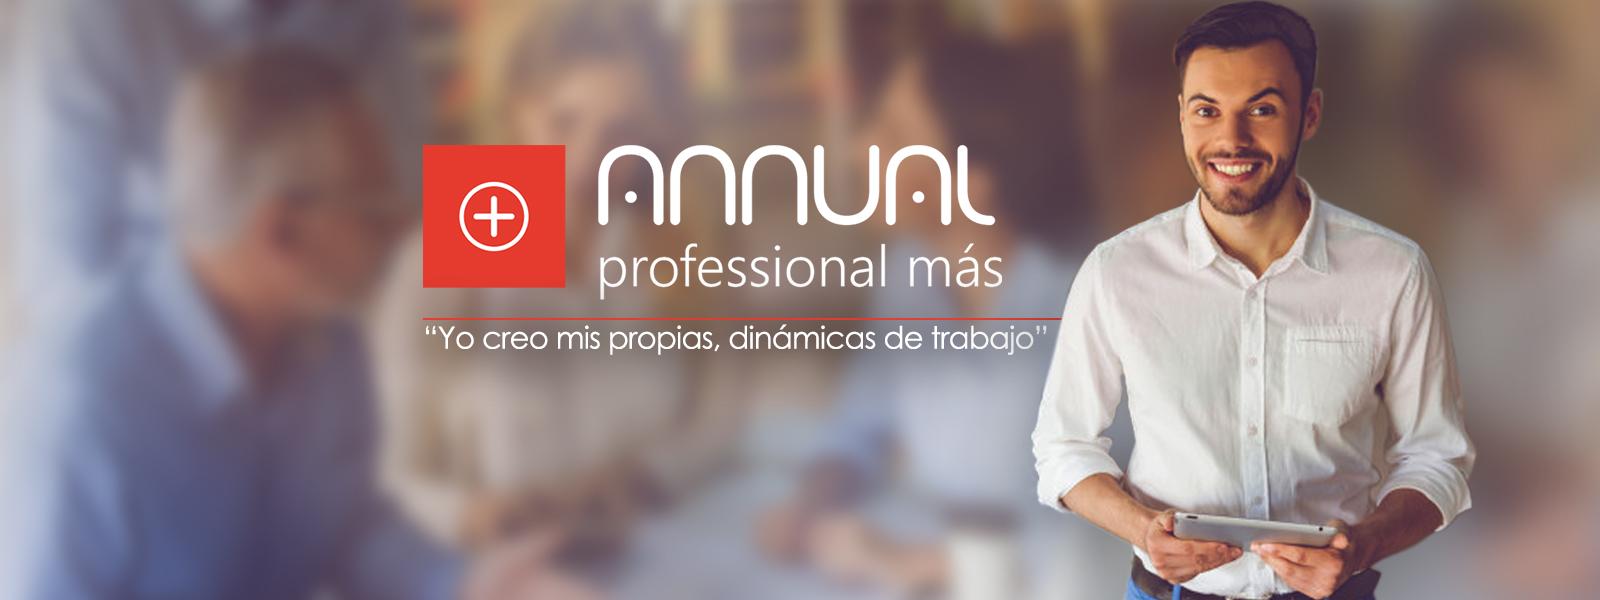 annual professional mas